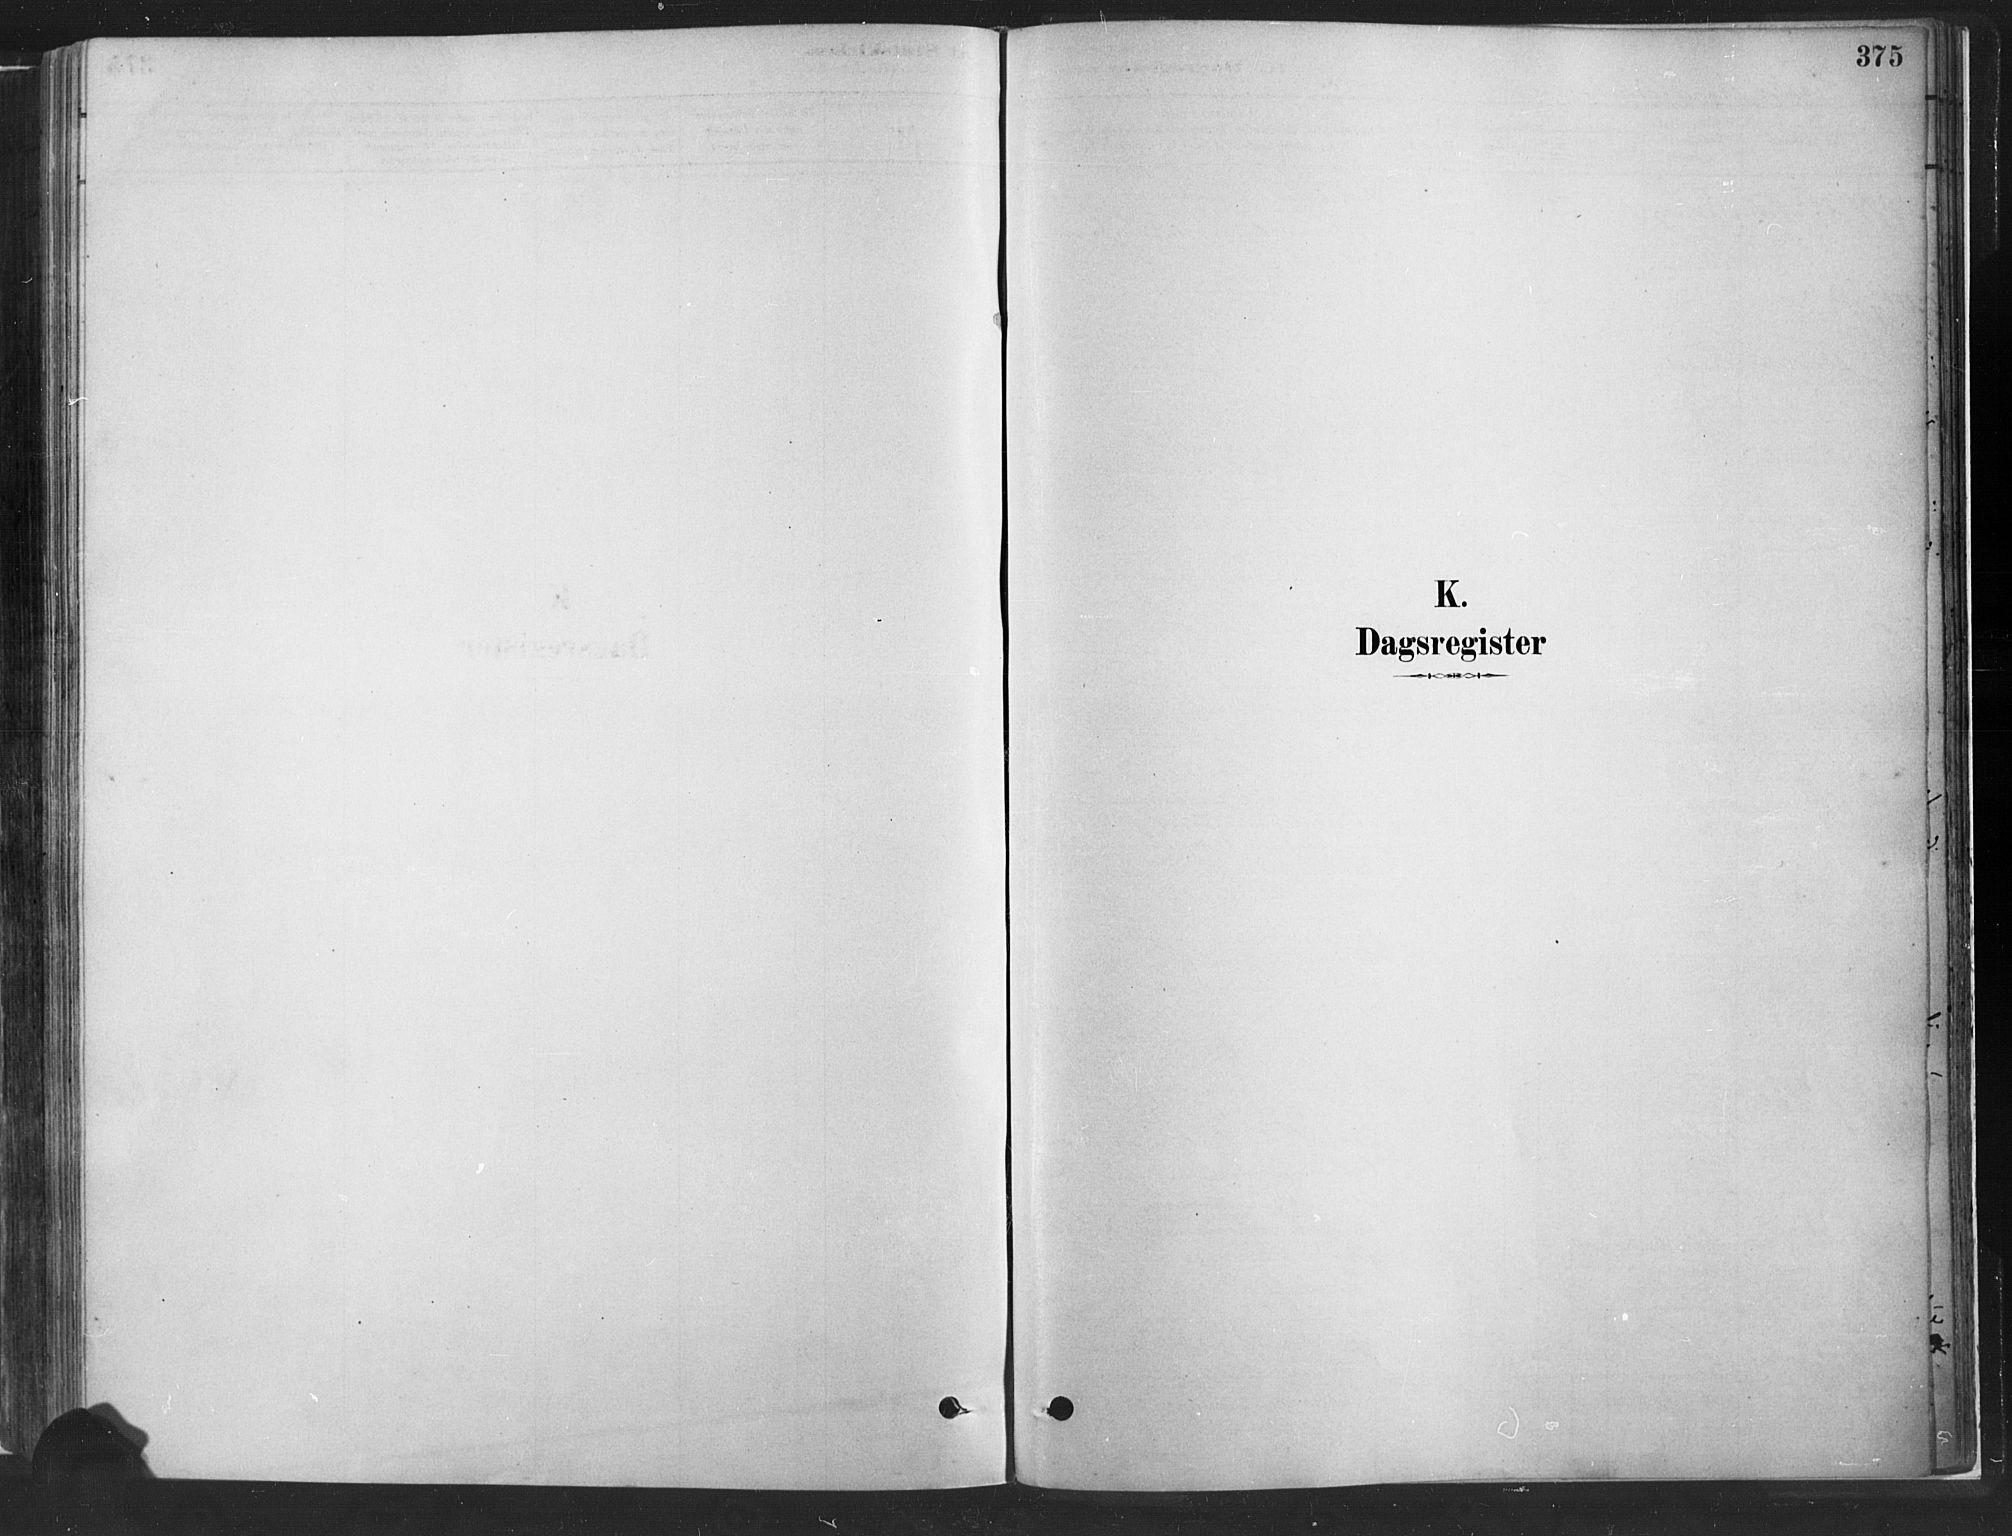 SAH, Fåberg prestekontor, Ministerialbok nr. 10, 1879-1900, s. 375